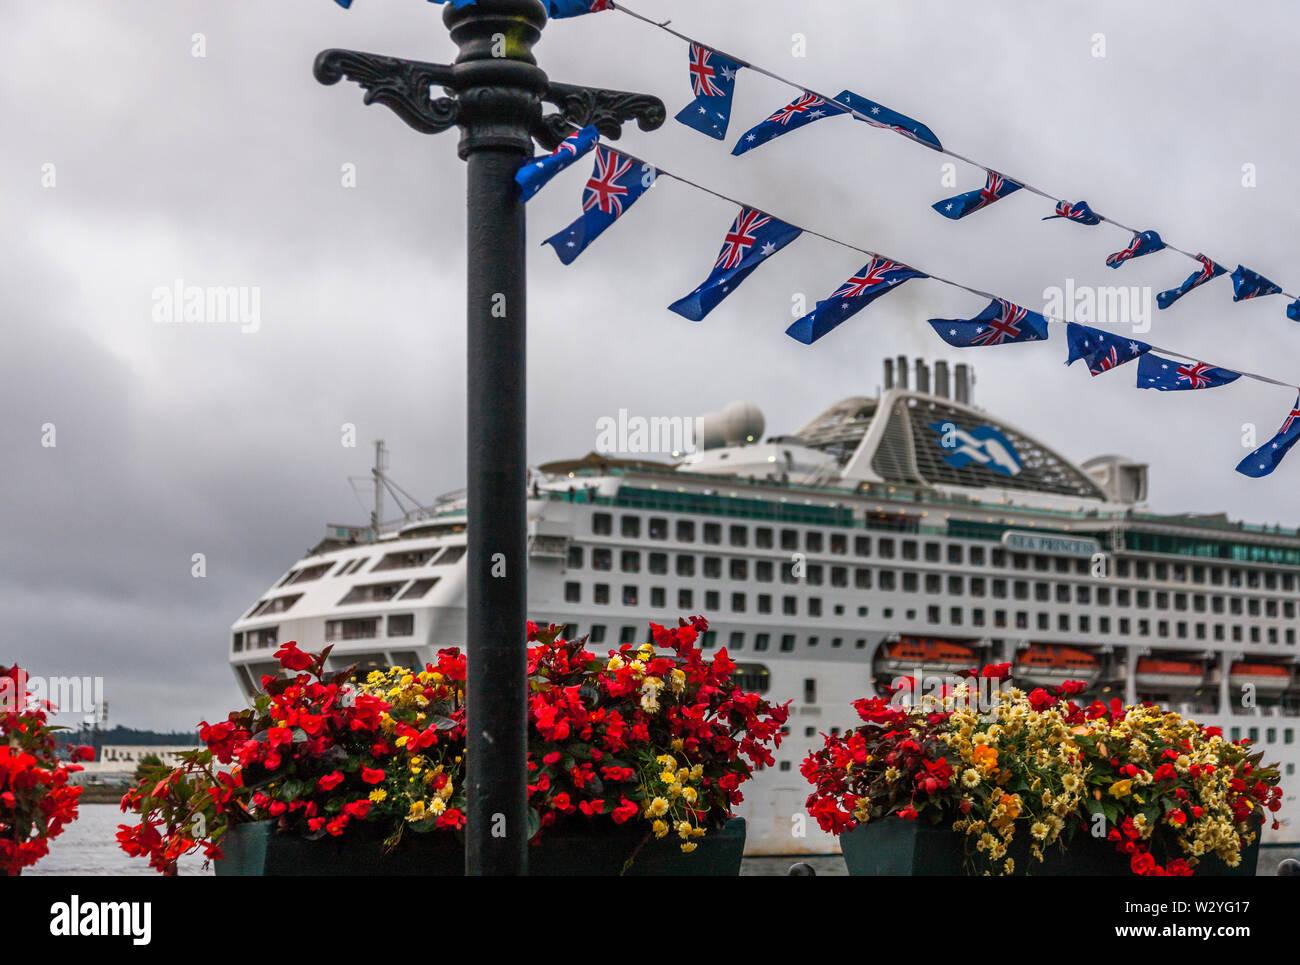 cruise deals july 2019 australia